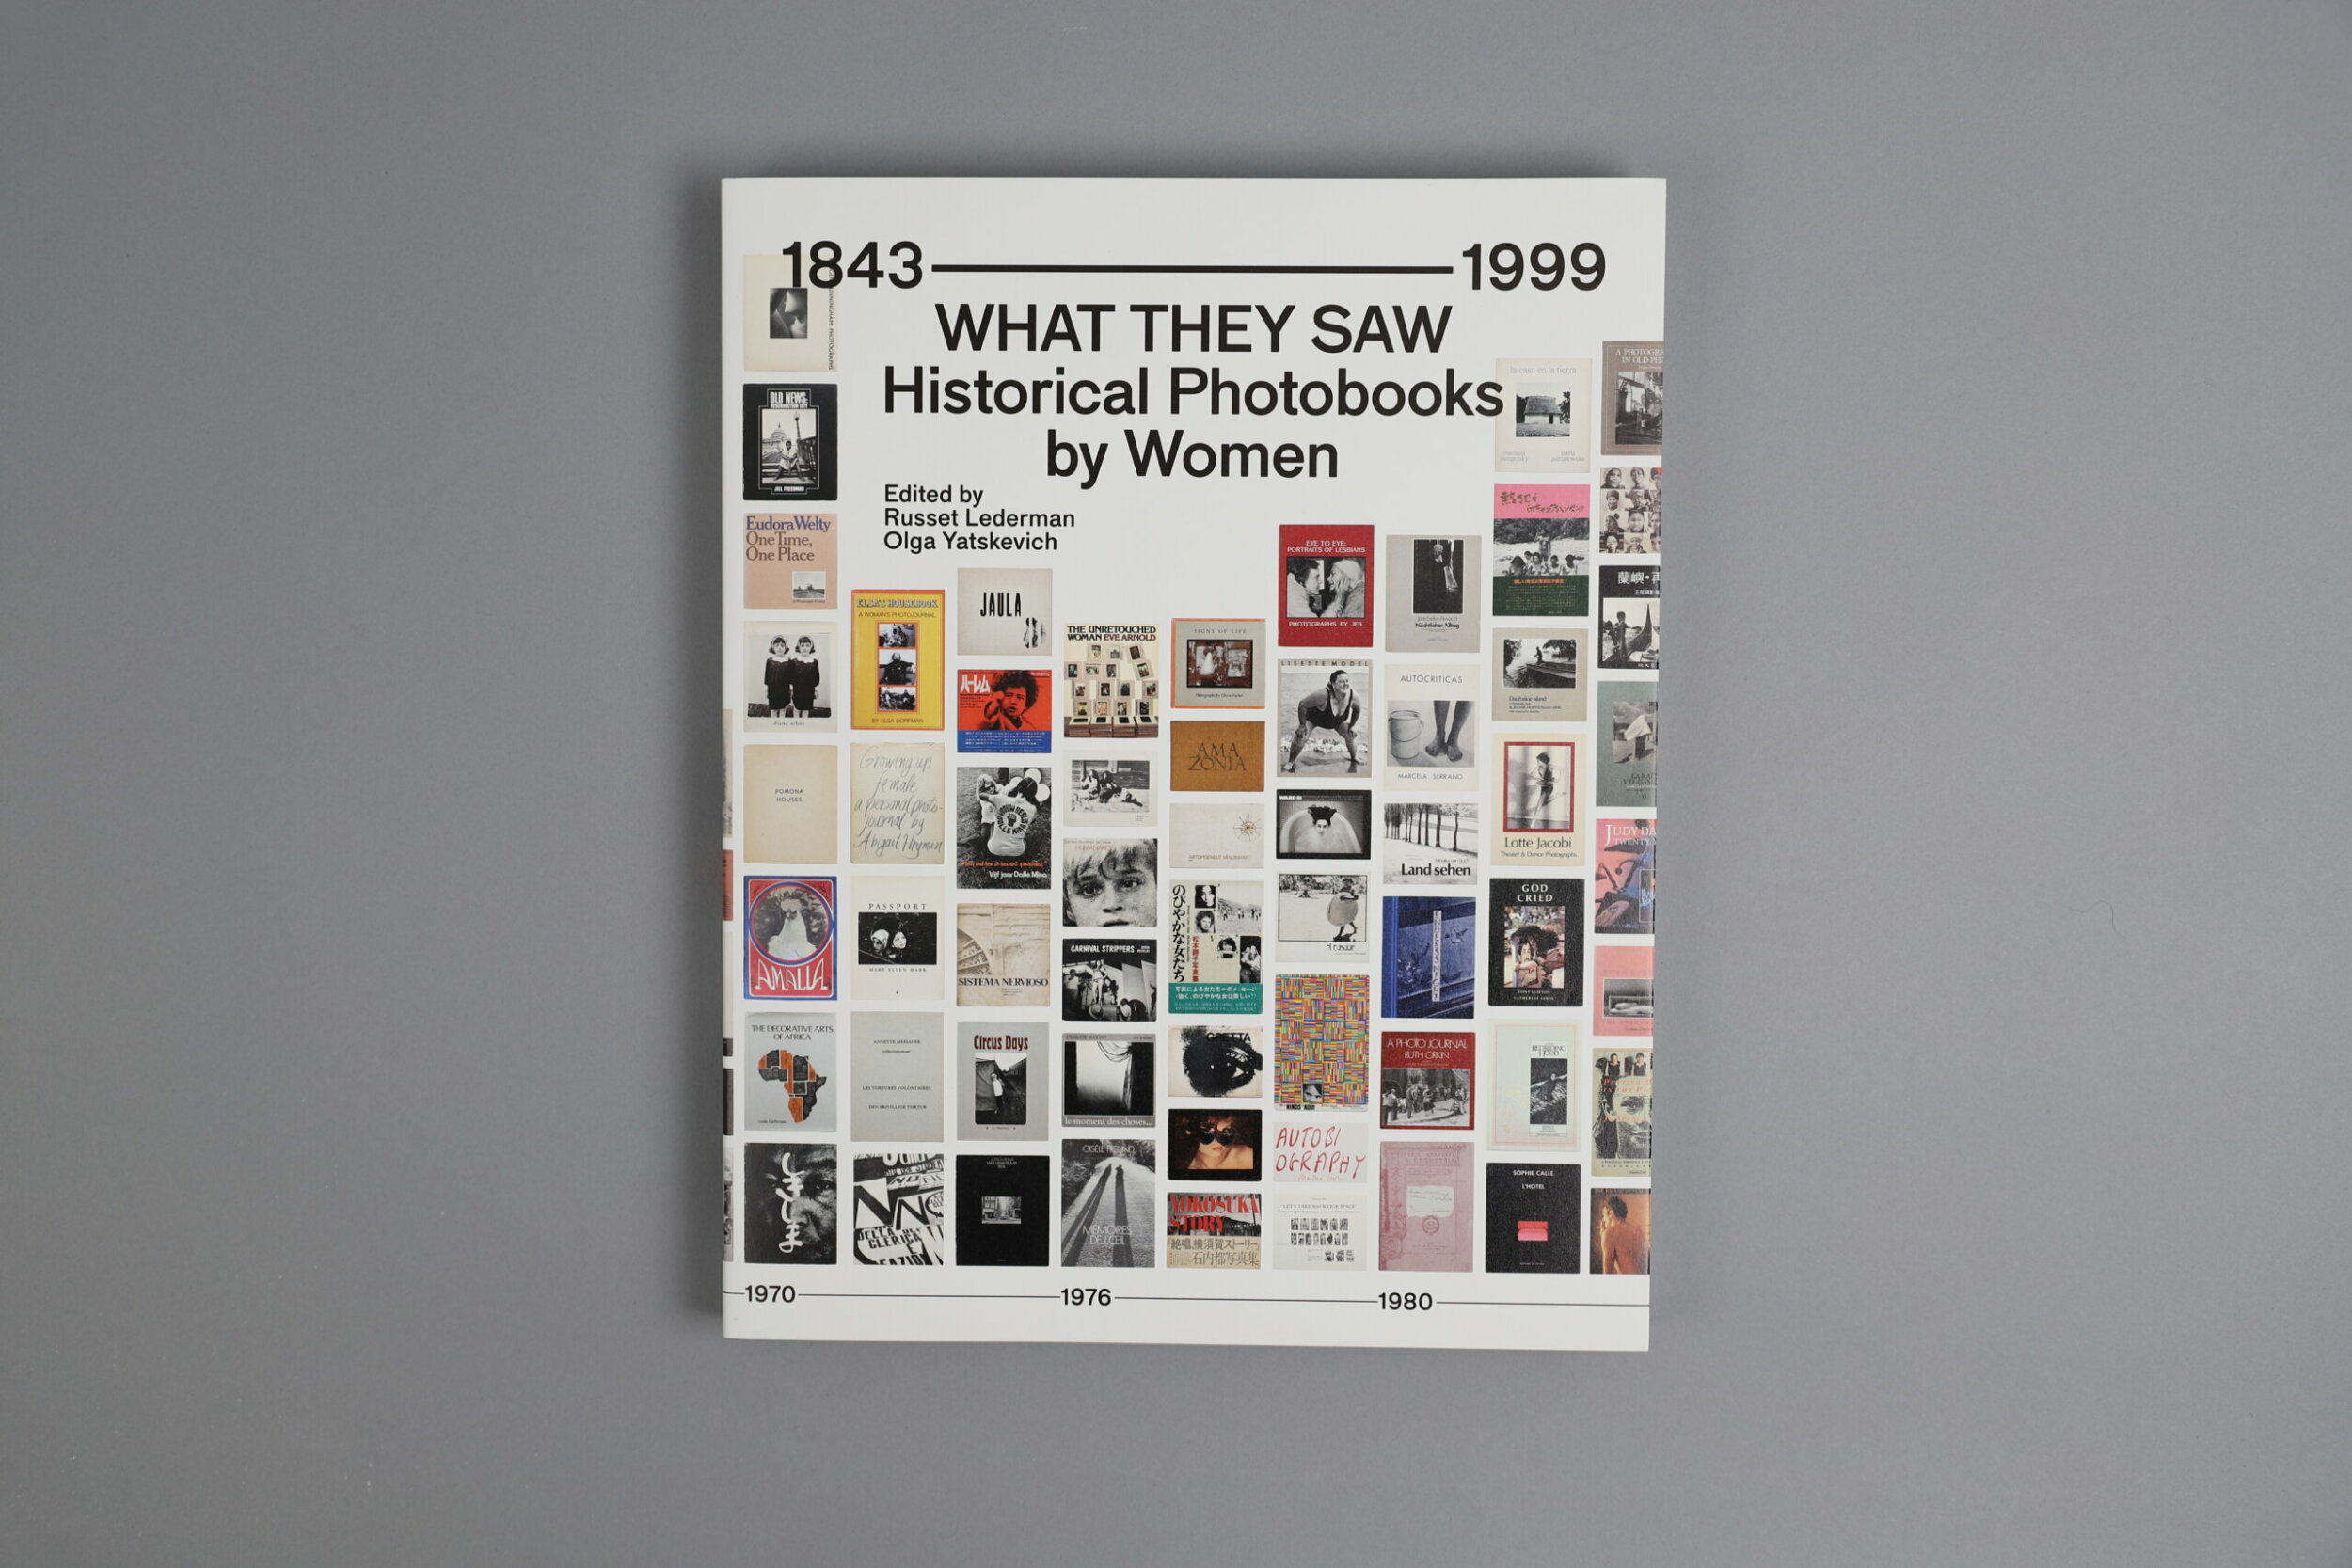 WhatTheySaw-RussetLederman-10x10books